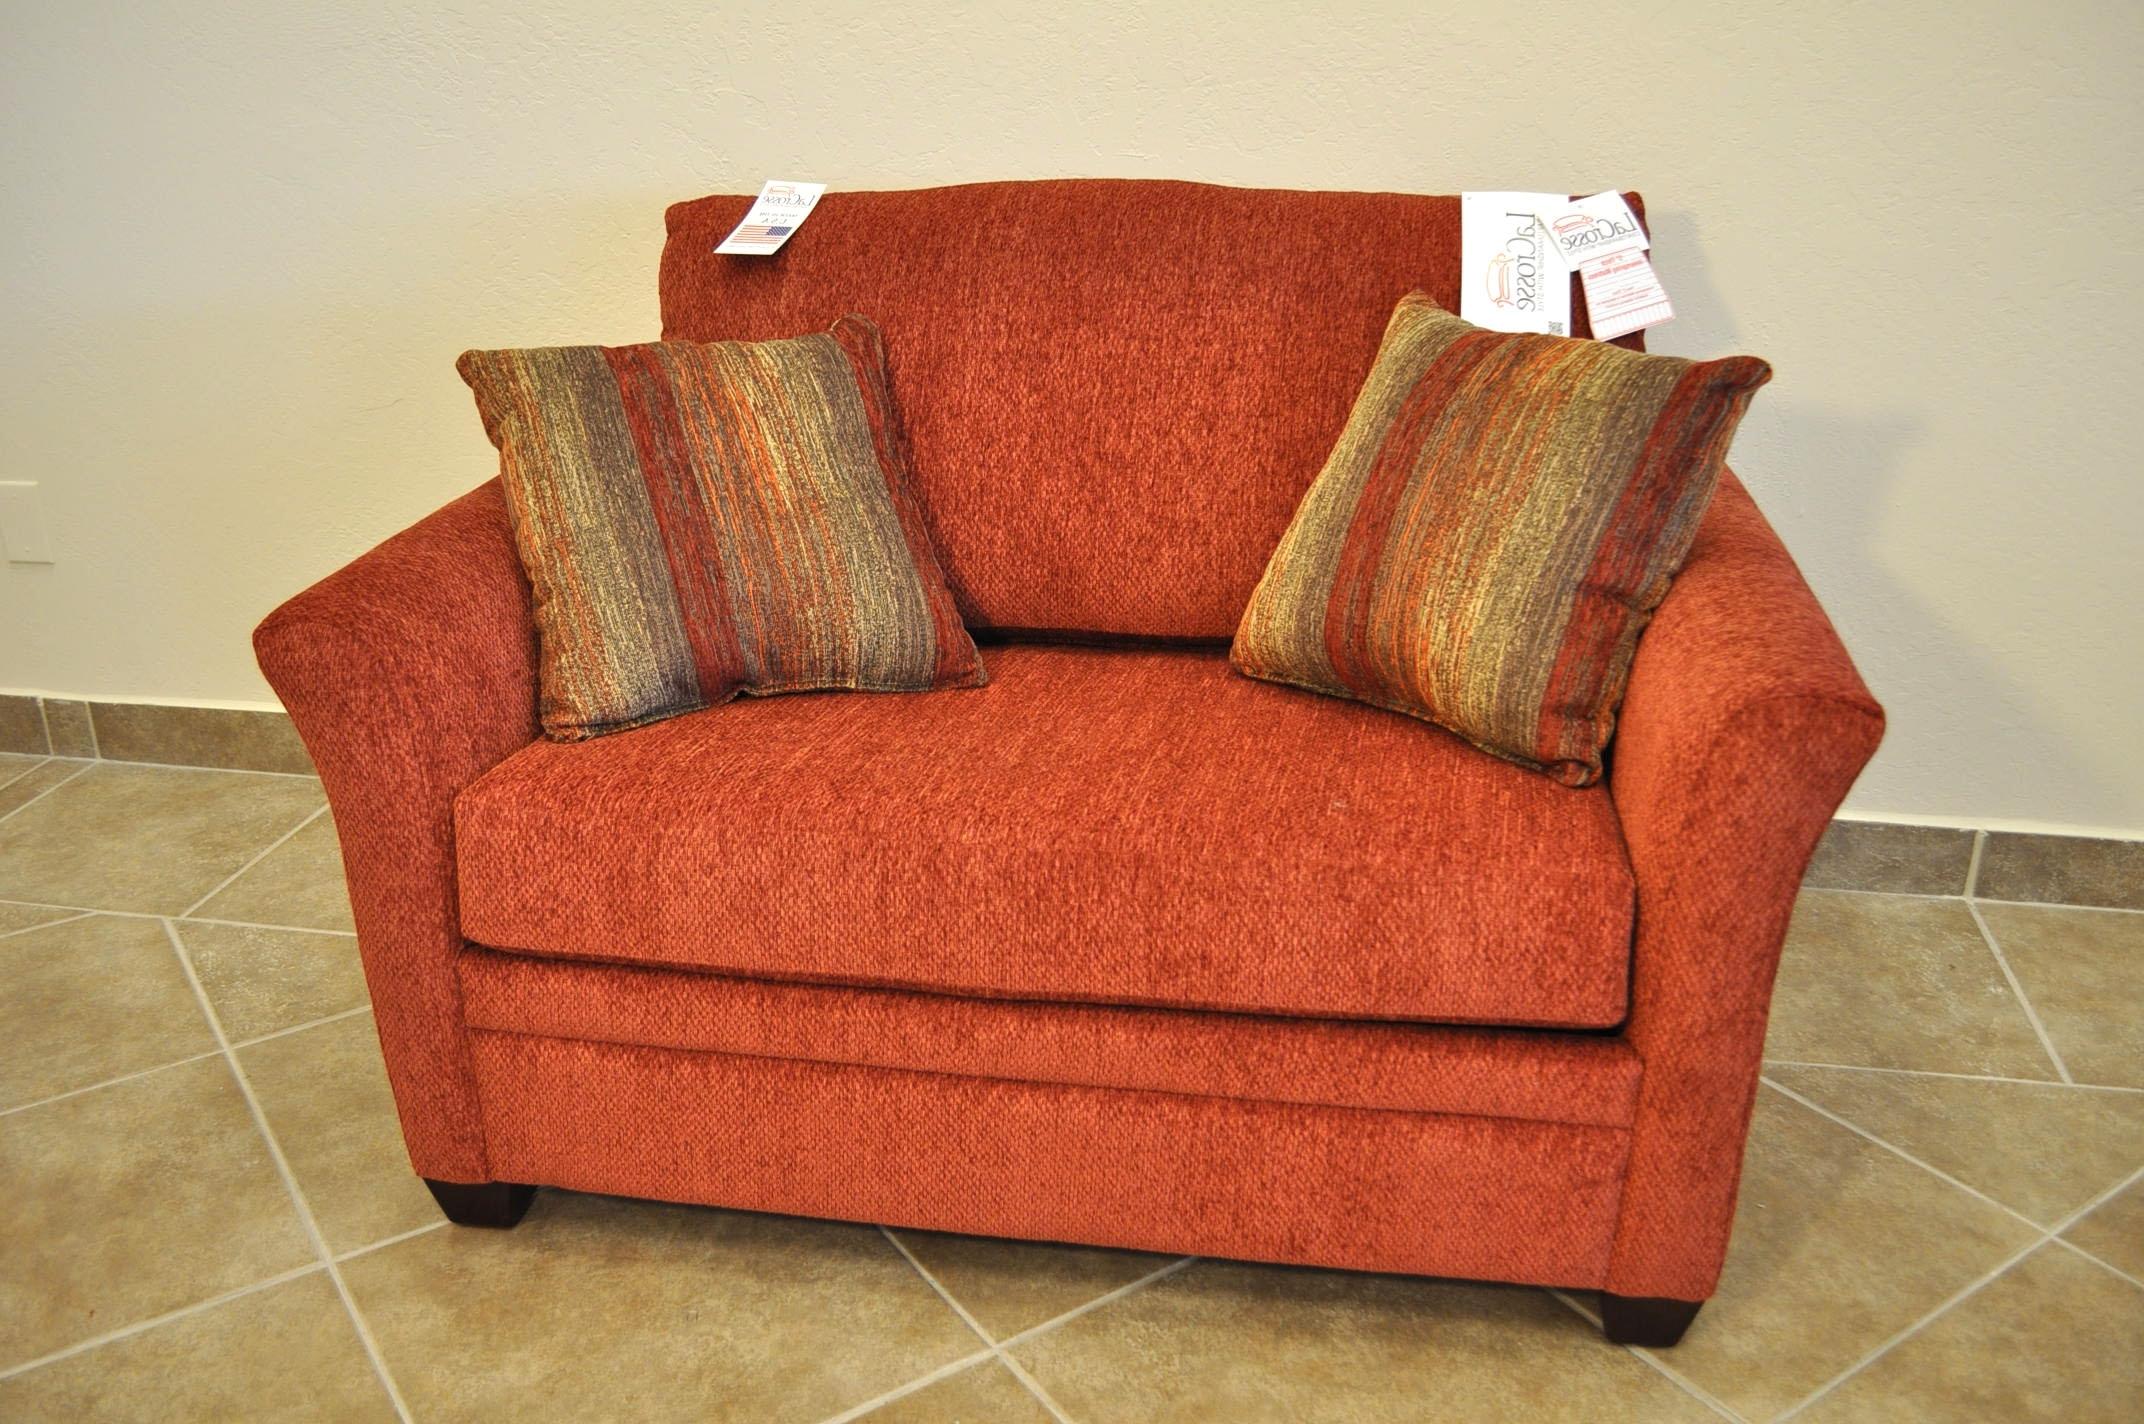 2017 Everett Wa Sectional Sofas Inside Furniture : 5 Sleeper Sofa Mattress Sleeper Sofa Vs Futon Mattress (View 9 of 15)